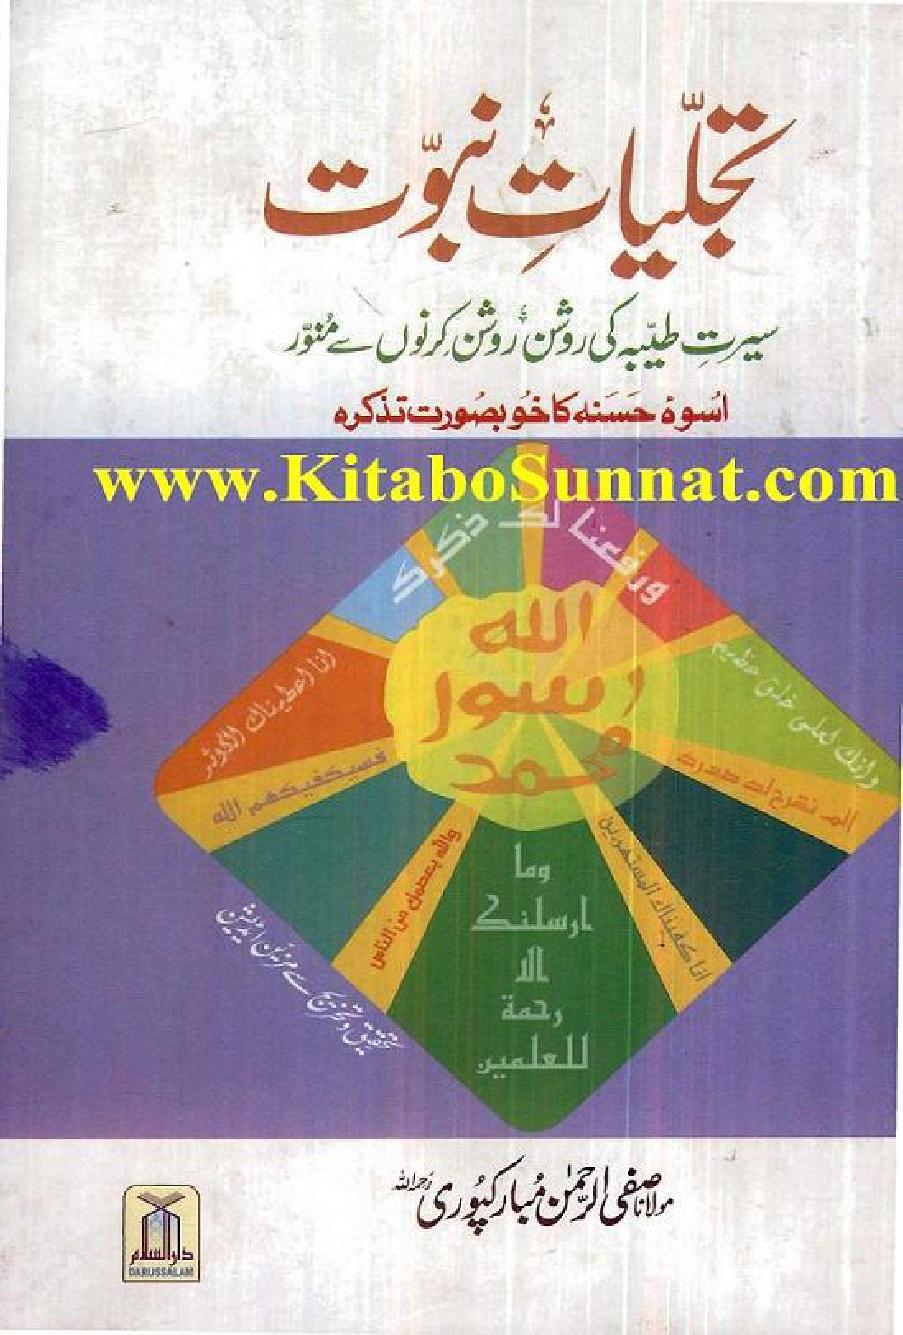 Tafseer-e-majidi urdu